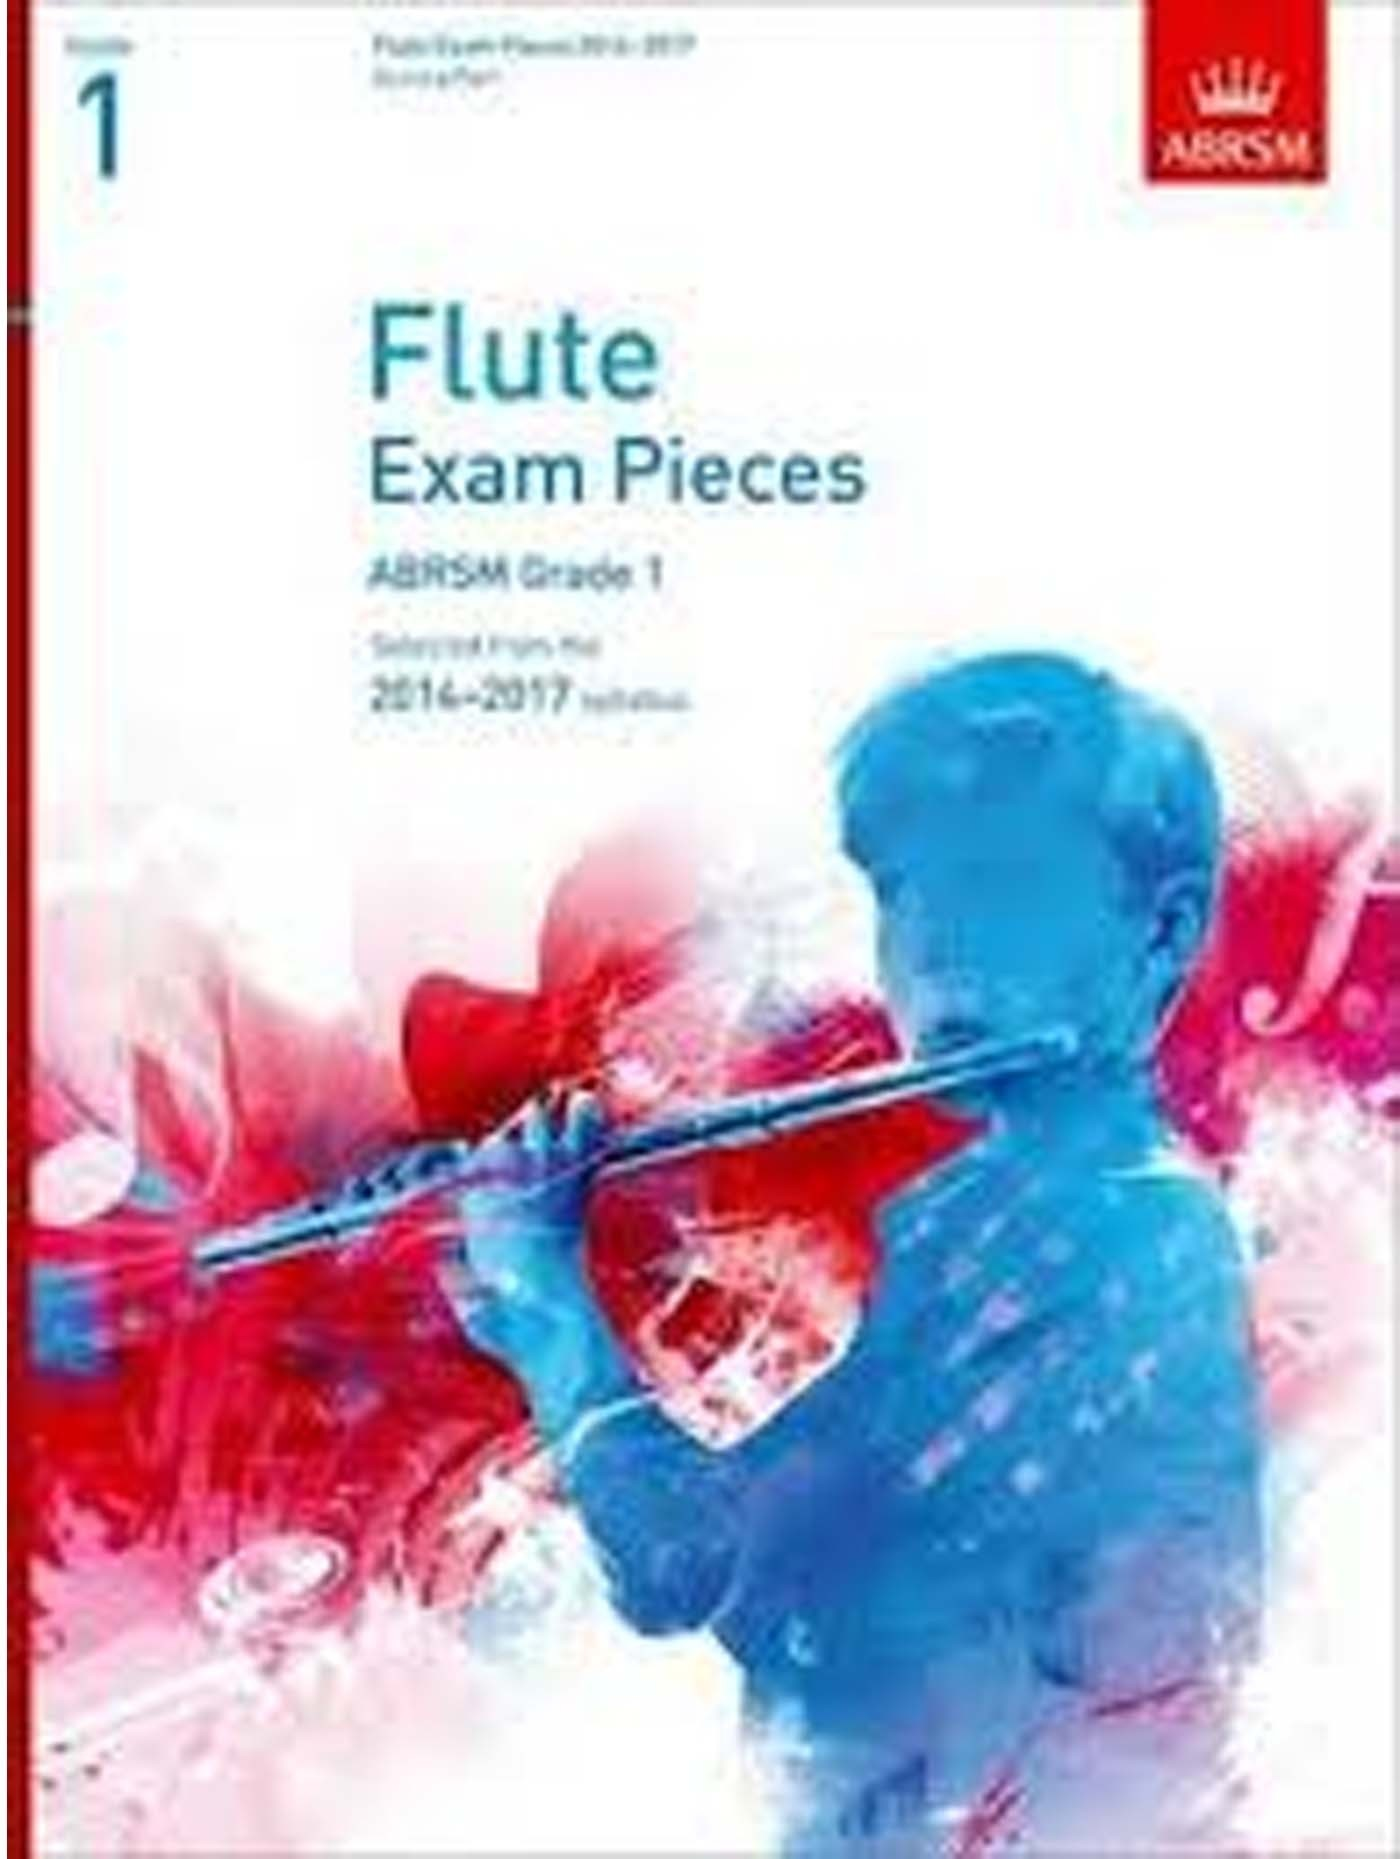 Flute Exam Pieces ABRSM Grade 1 2014-2017 Score & Part Book S162